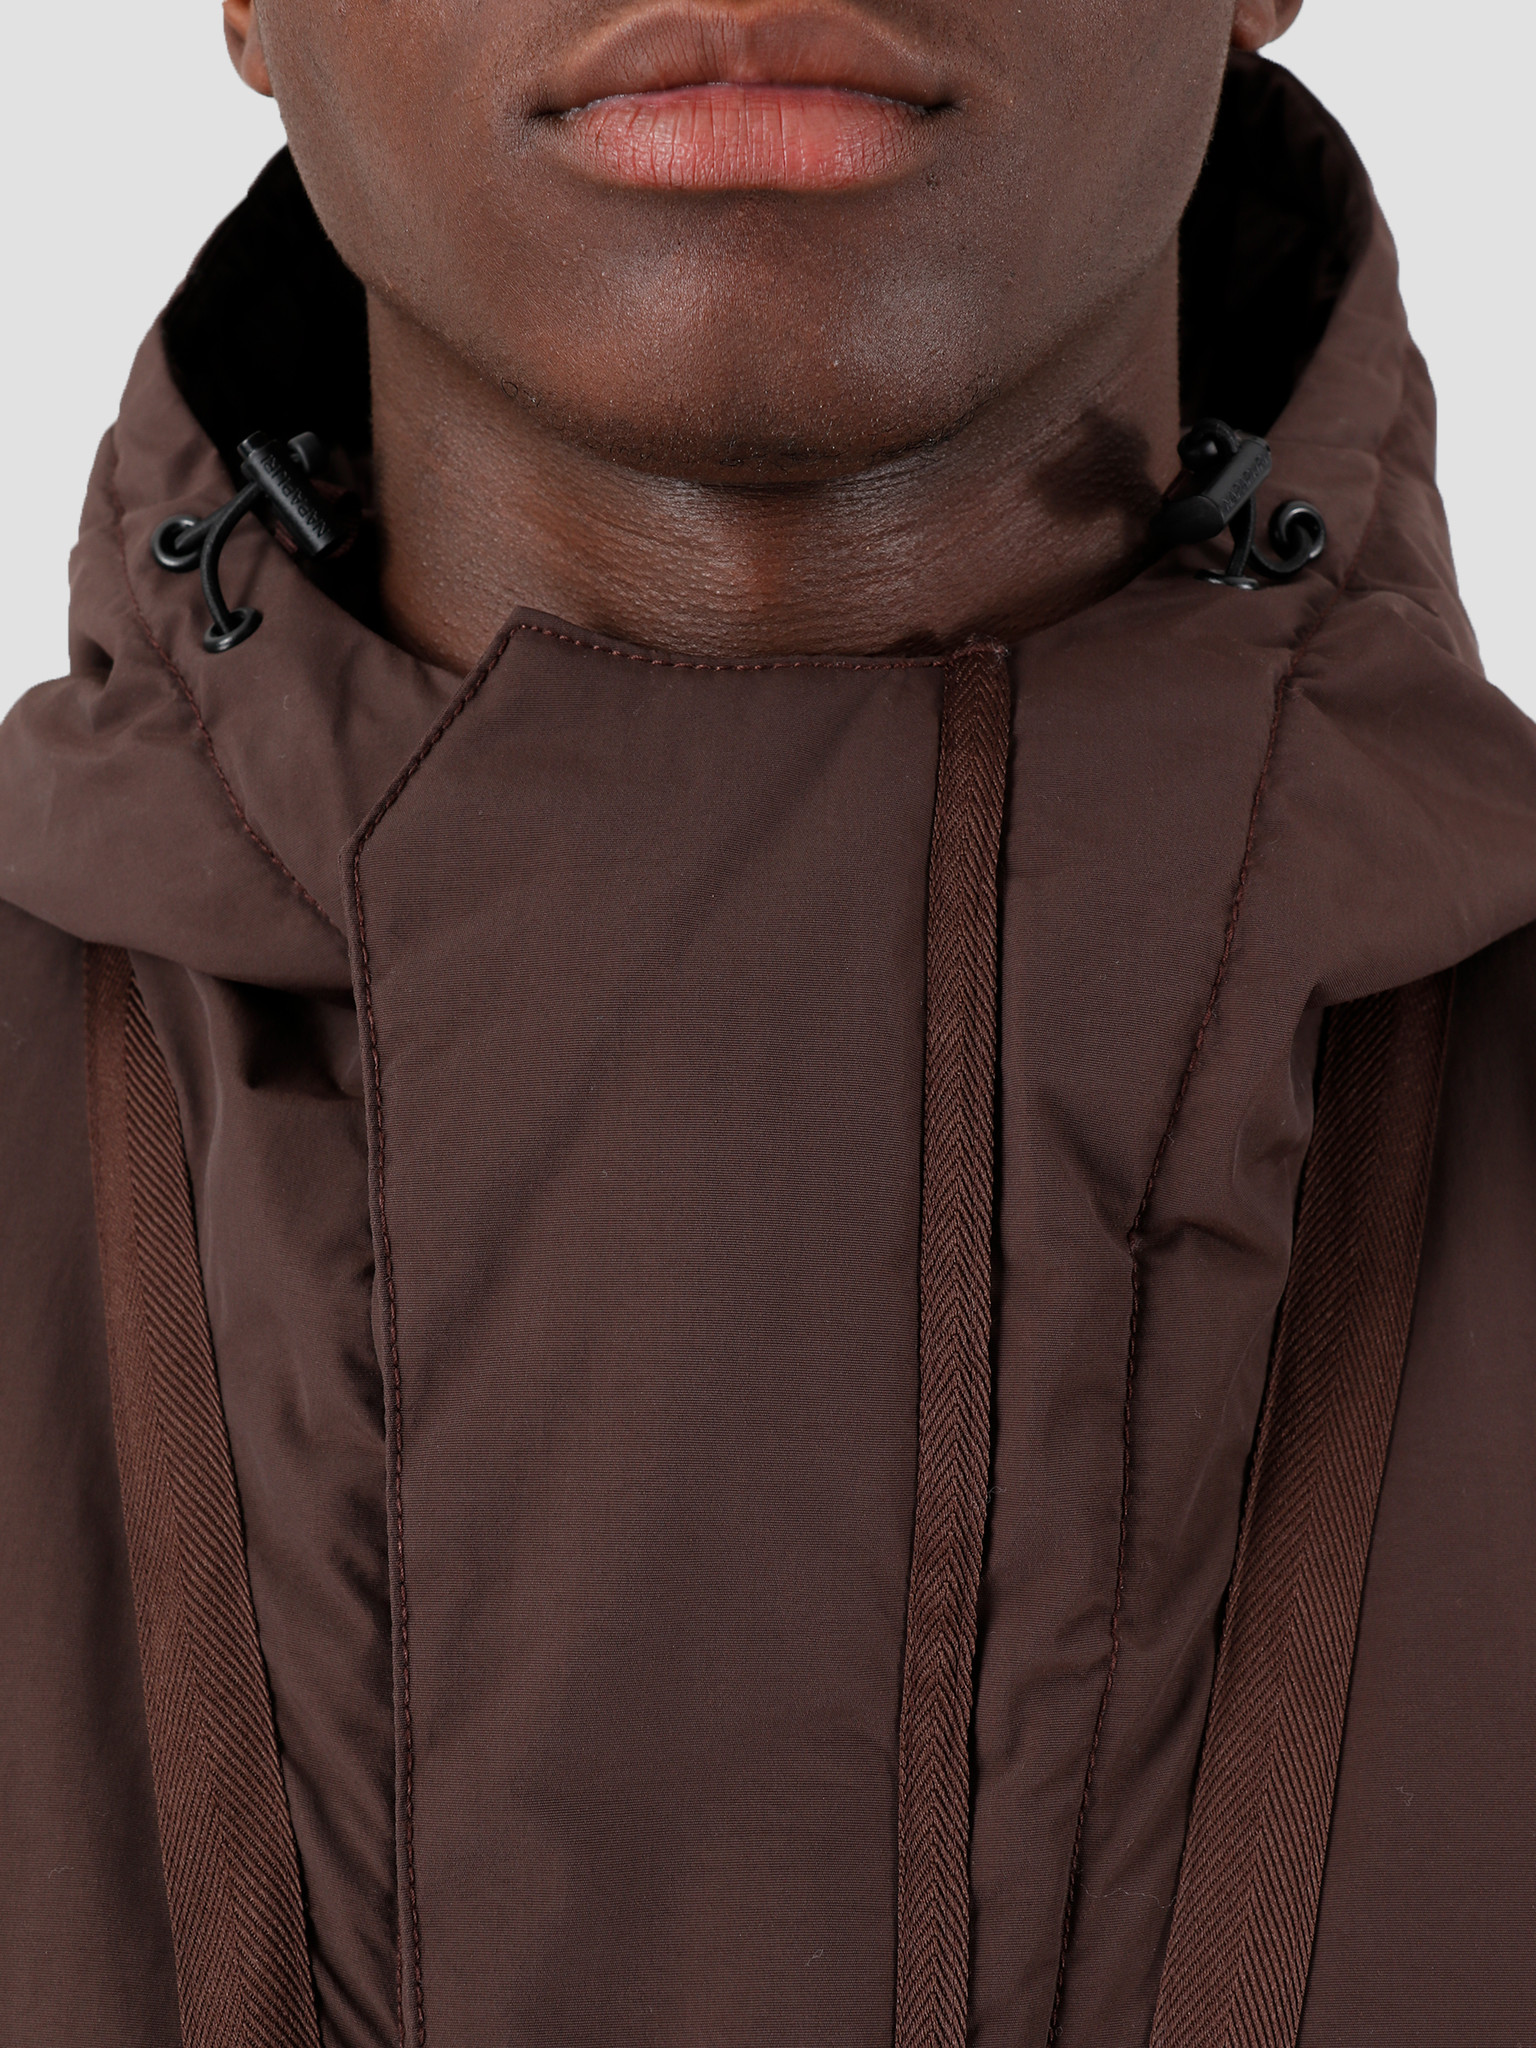 NAPAPIJRI NAPAPIJRI The Tribe Skidoo Creator Parka Choco Brown N0YIU5W25